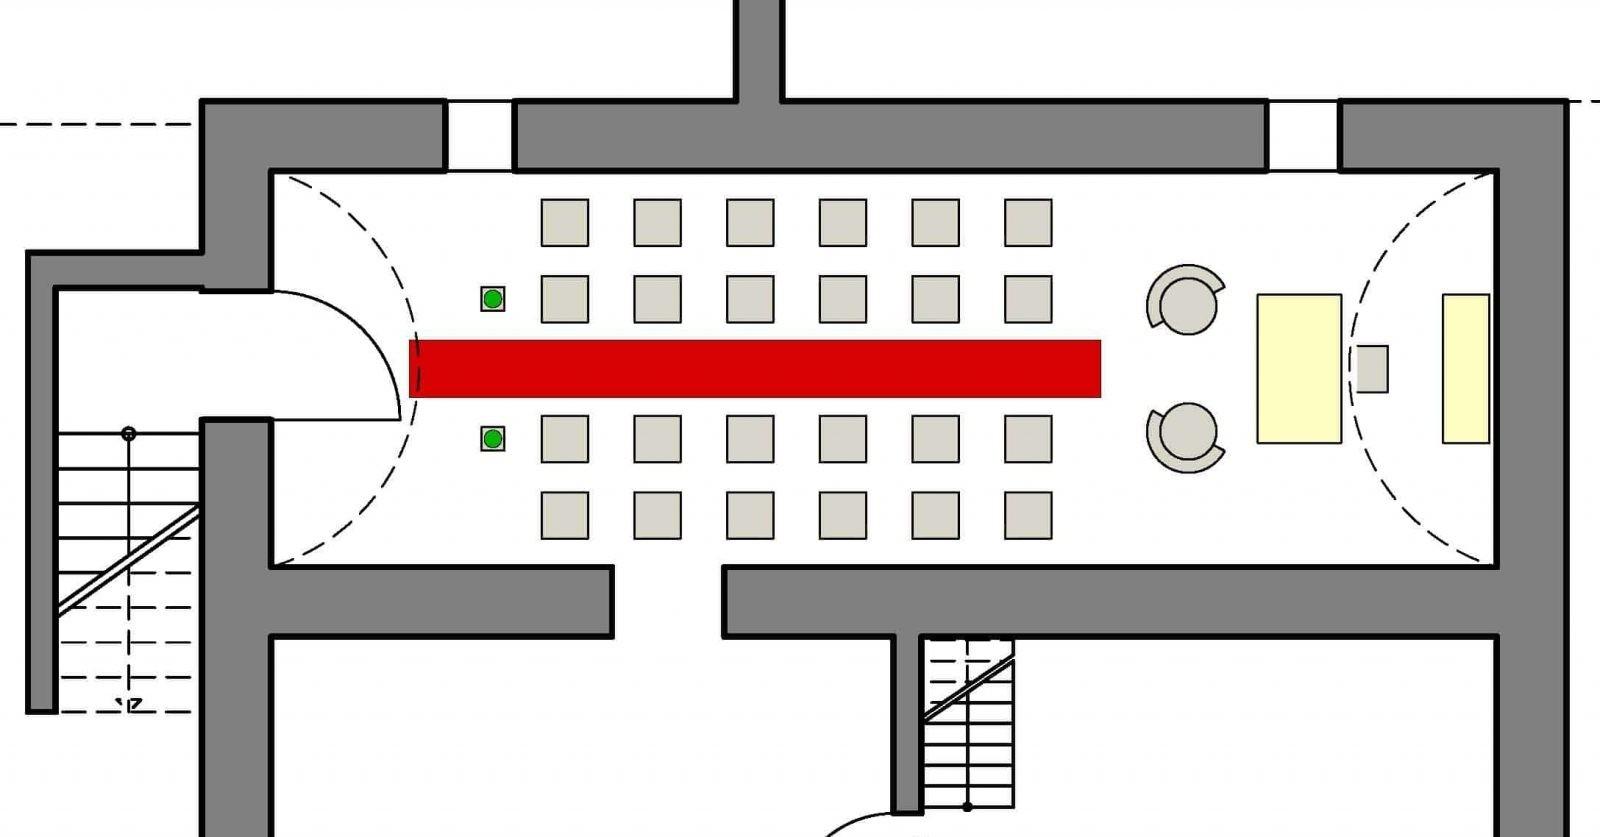 Grundriss Gewölbekeller Haus in Bewegung Seelscheid